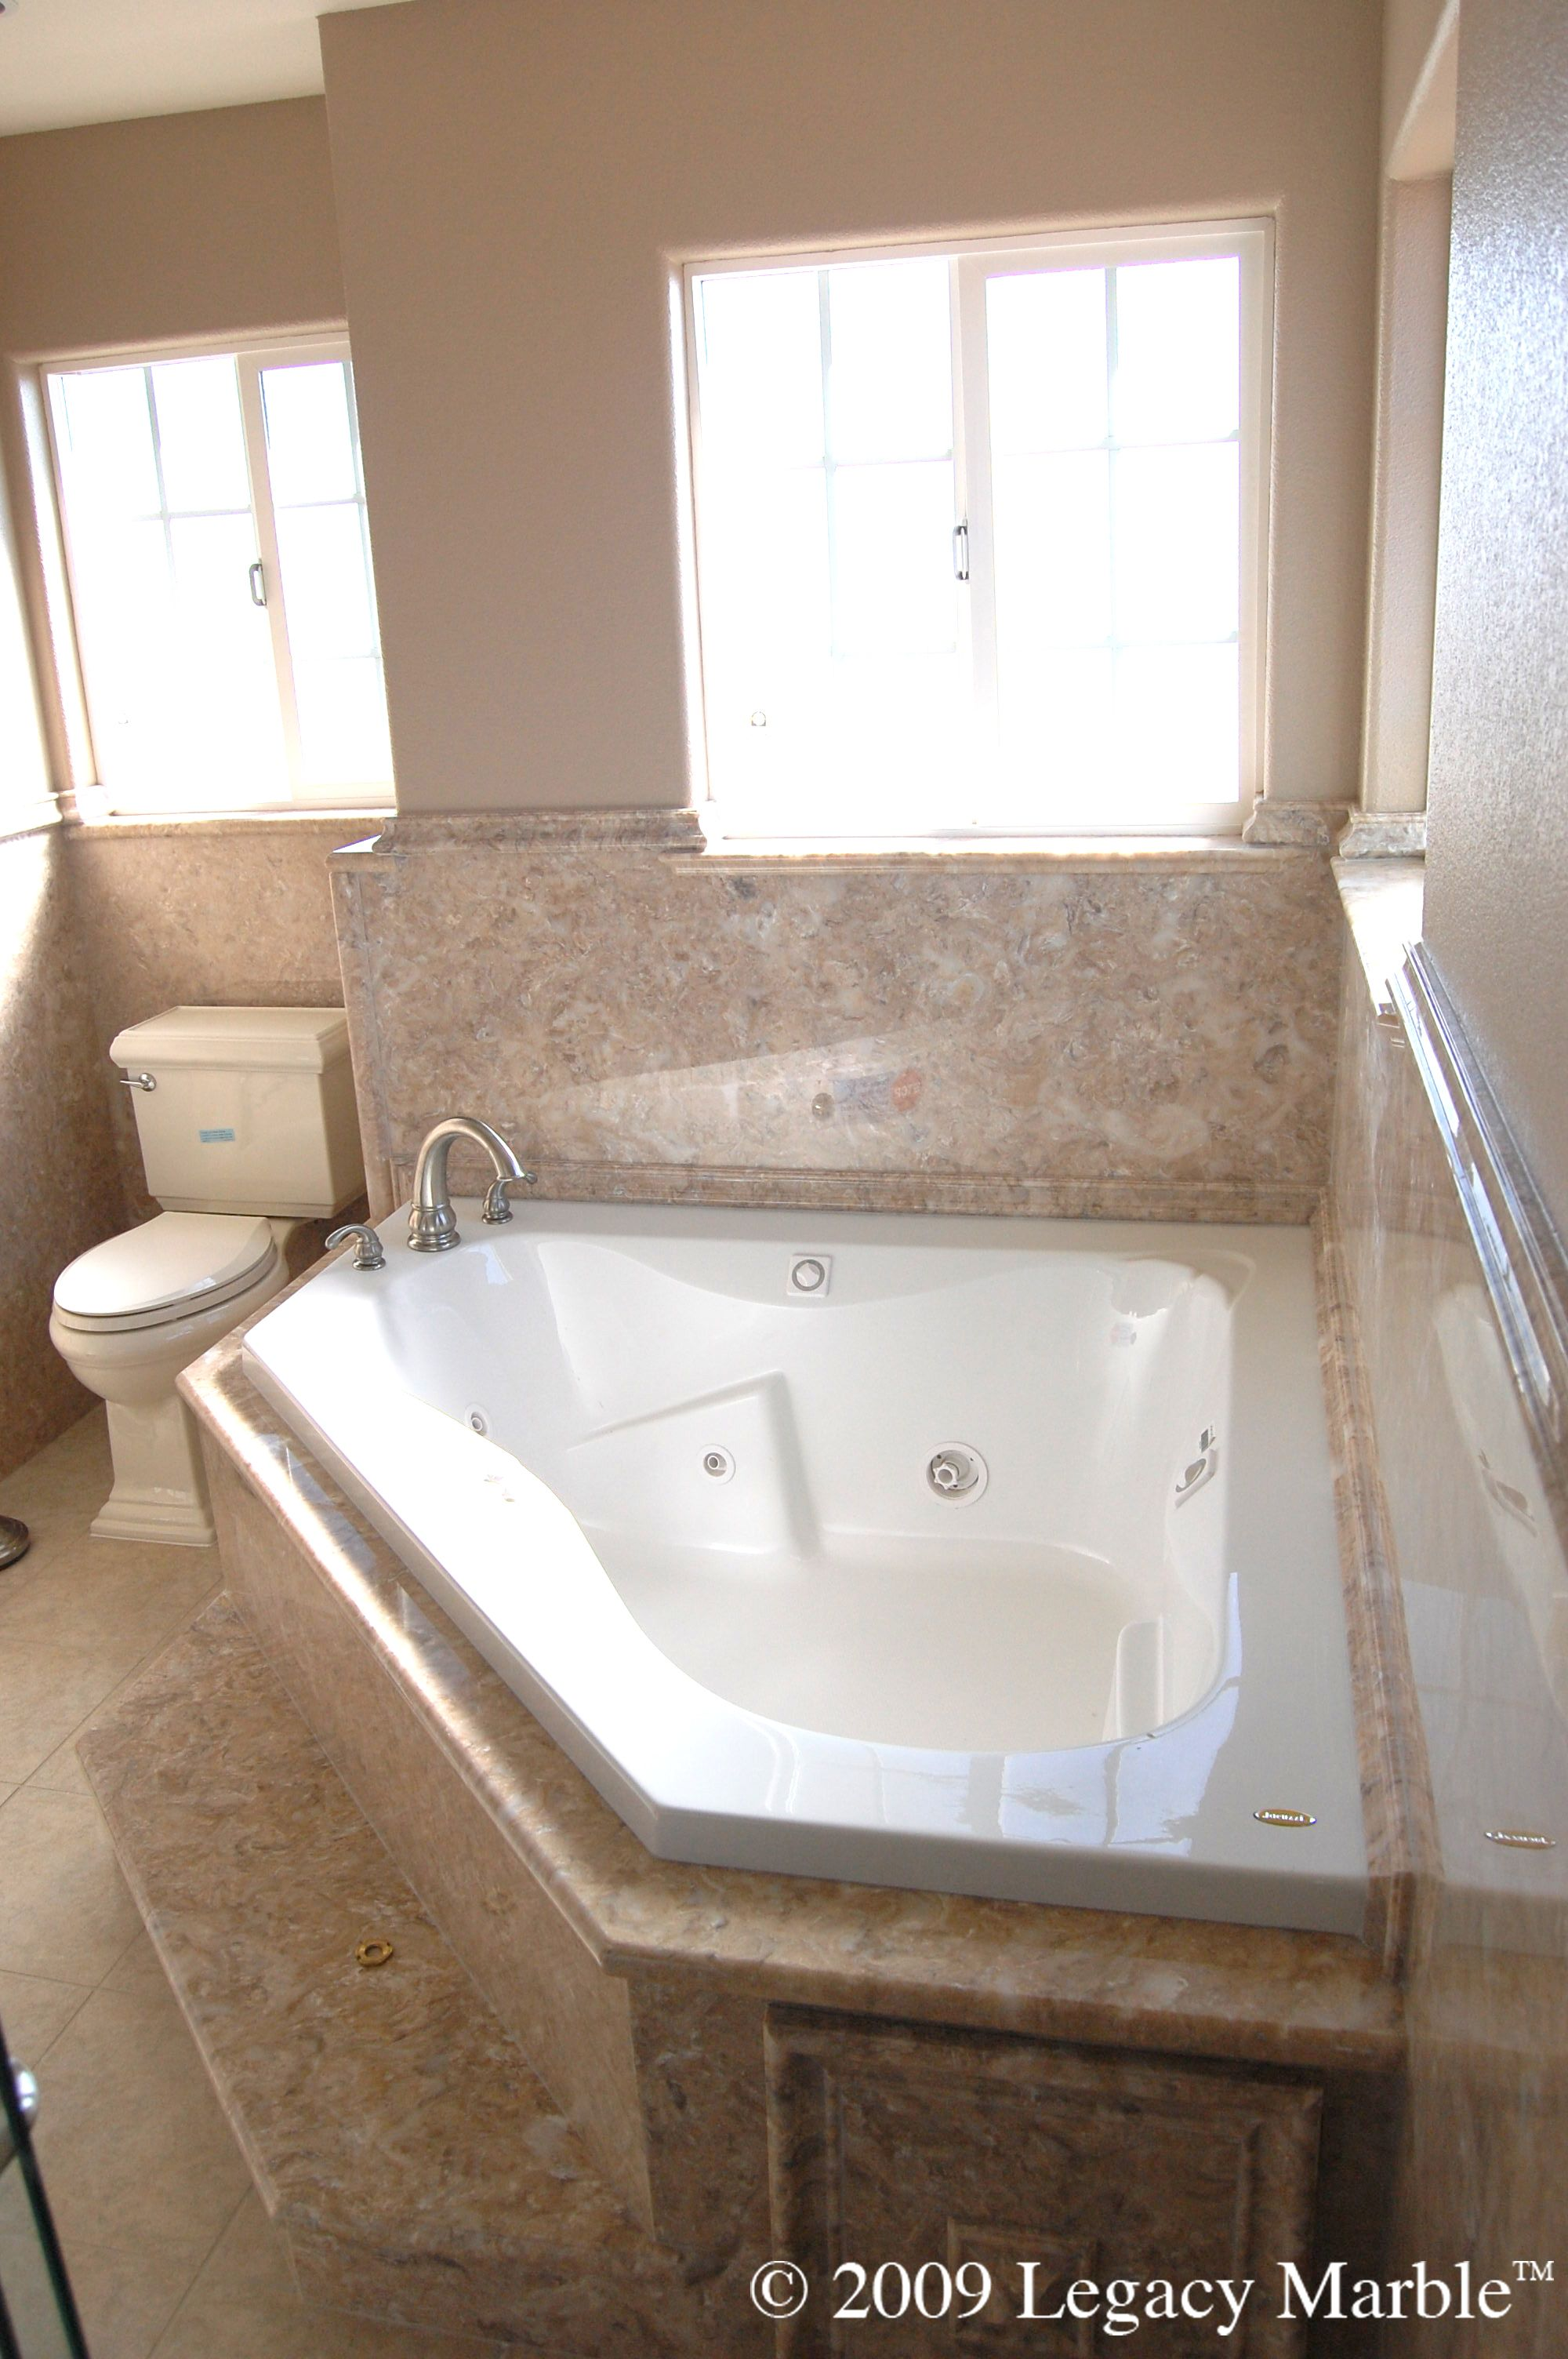 Corner Jet Tub And Shower Combination Game Bathtubs